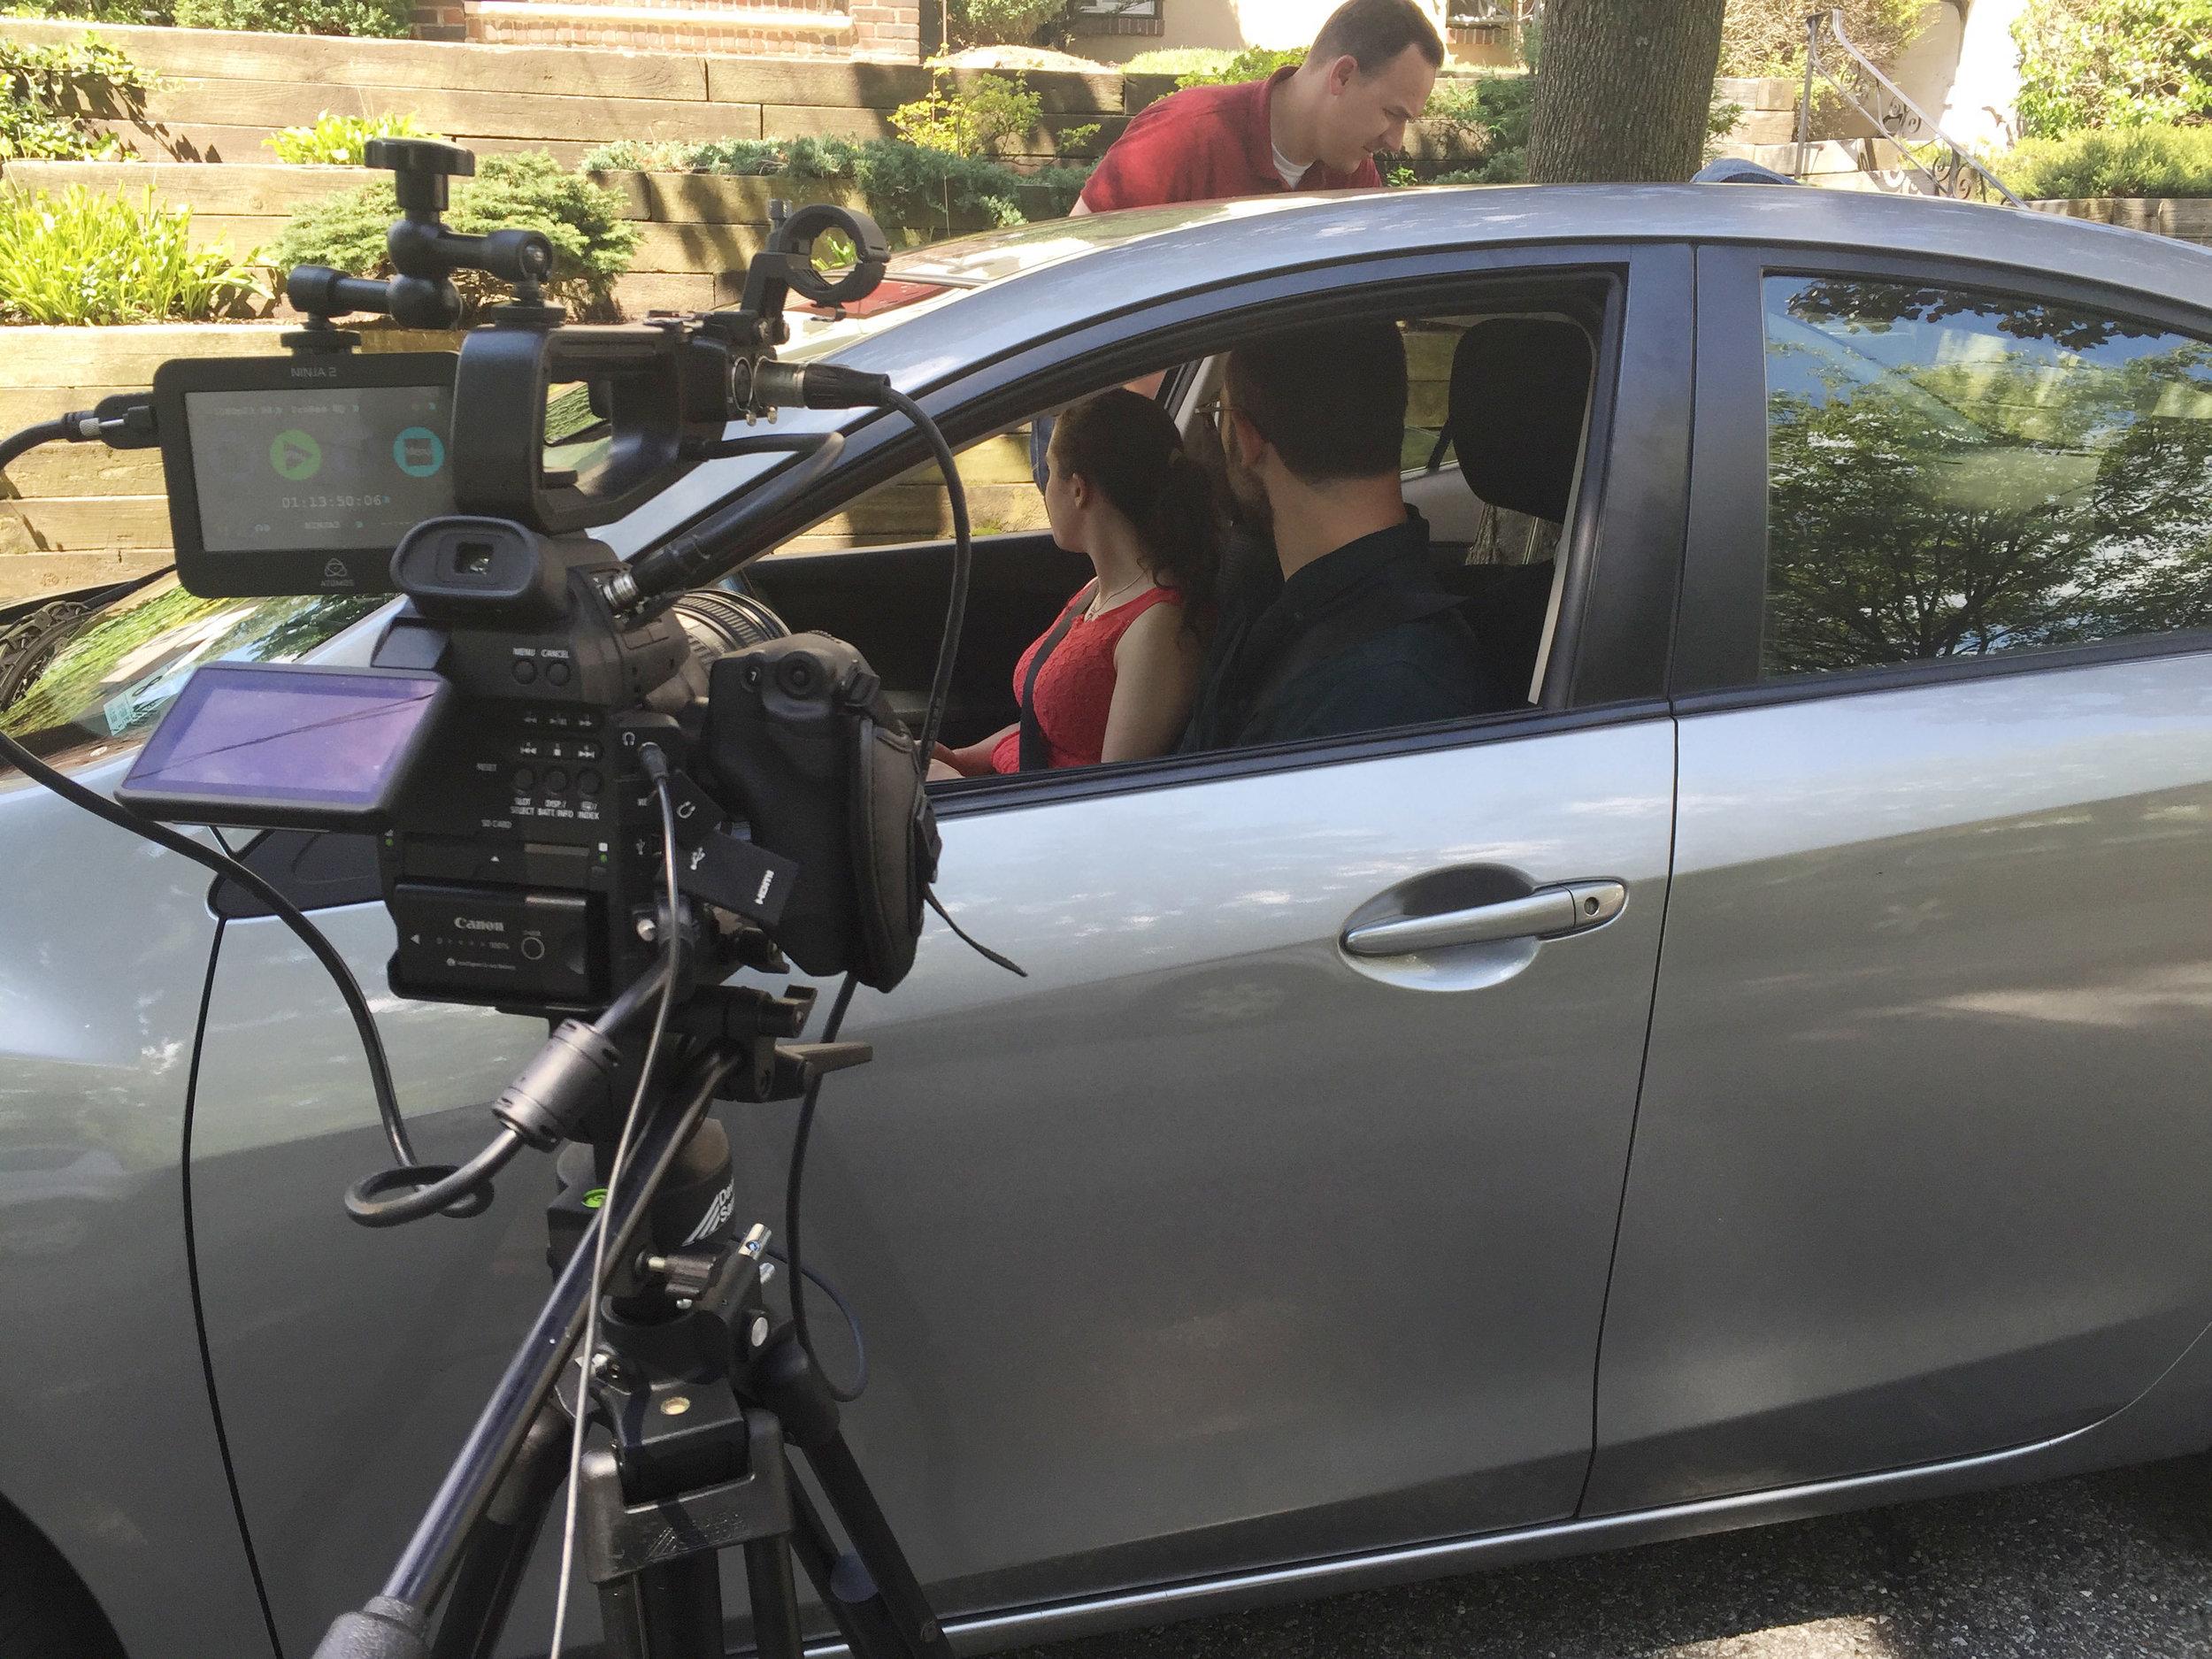 Getting the car shot